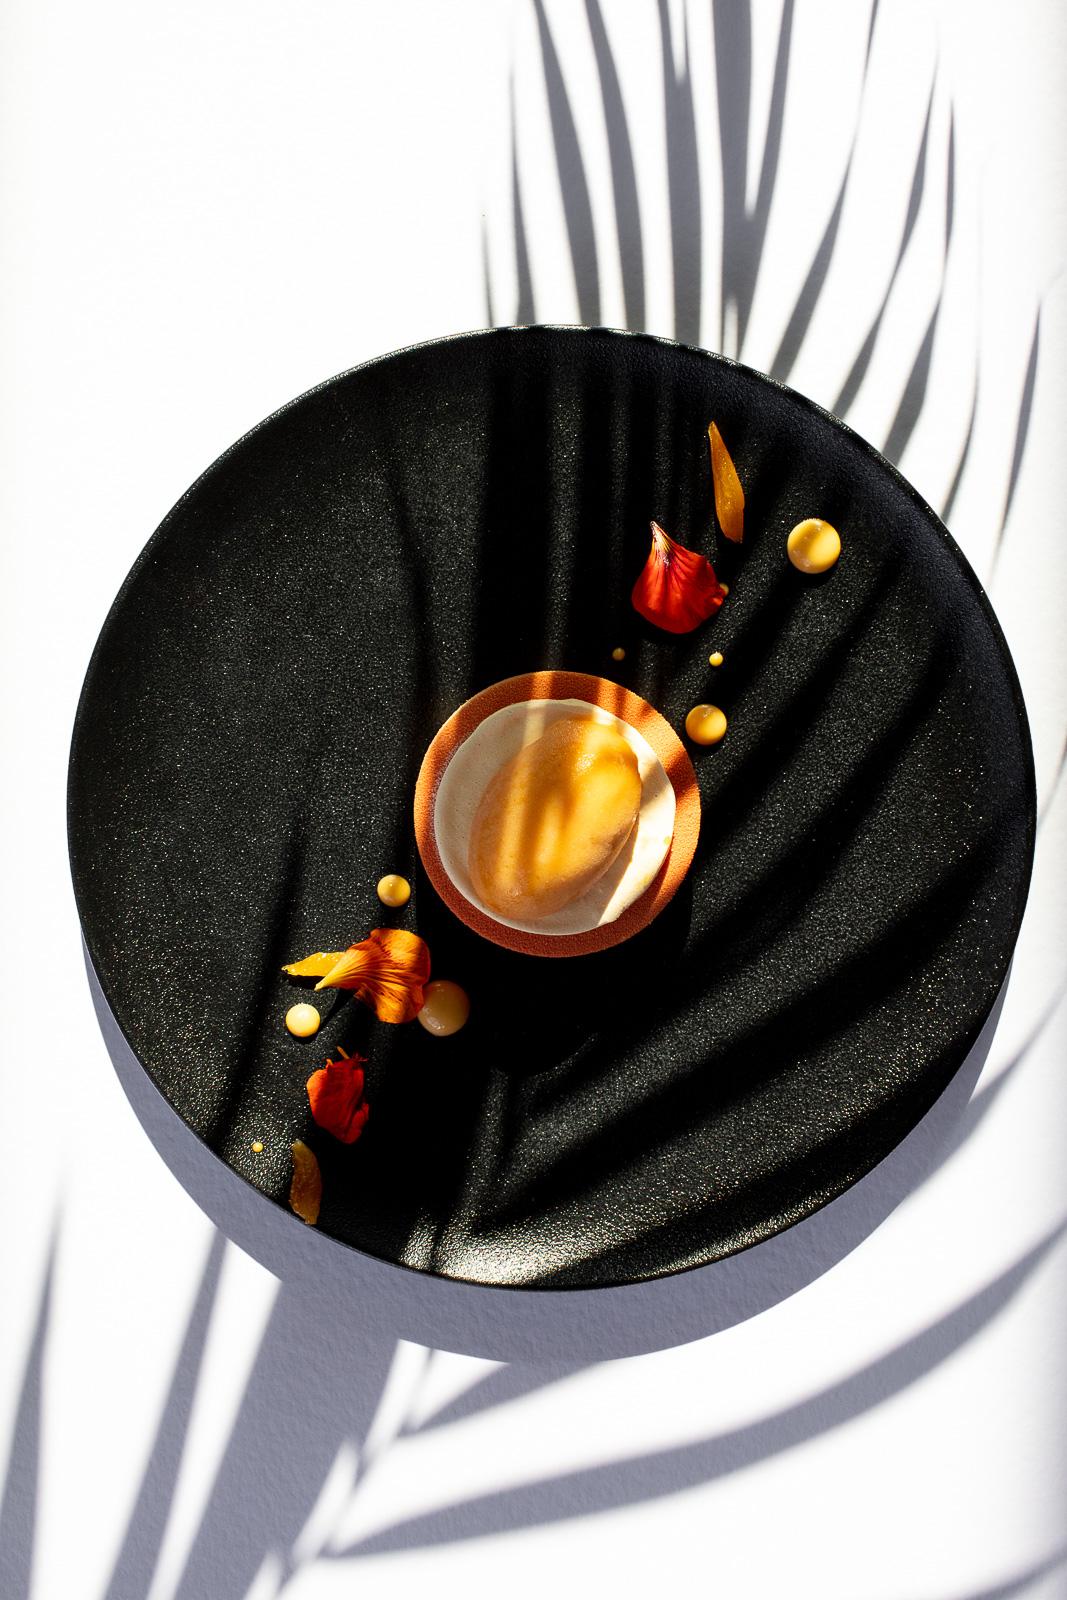 Franck_Hamel_food_photographer_photographeculinaire_valerie_paumelle_agent_st_clair_traiteur (4).jpg